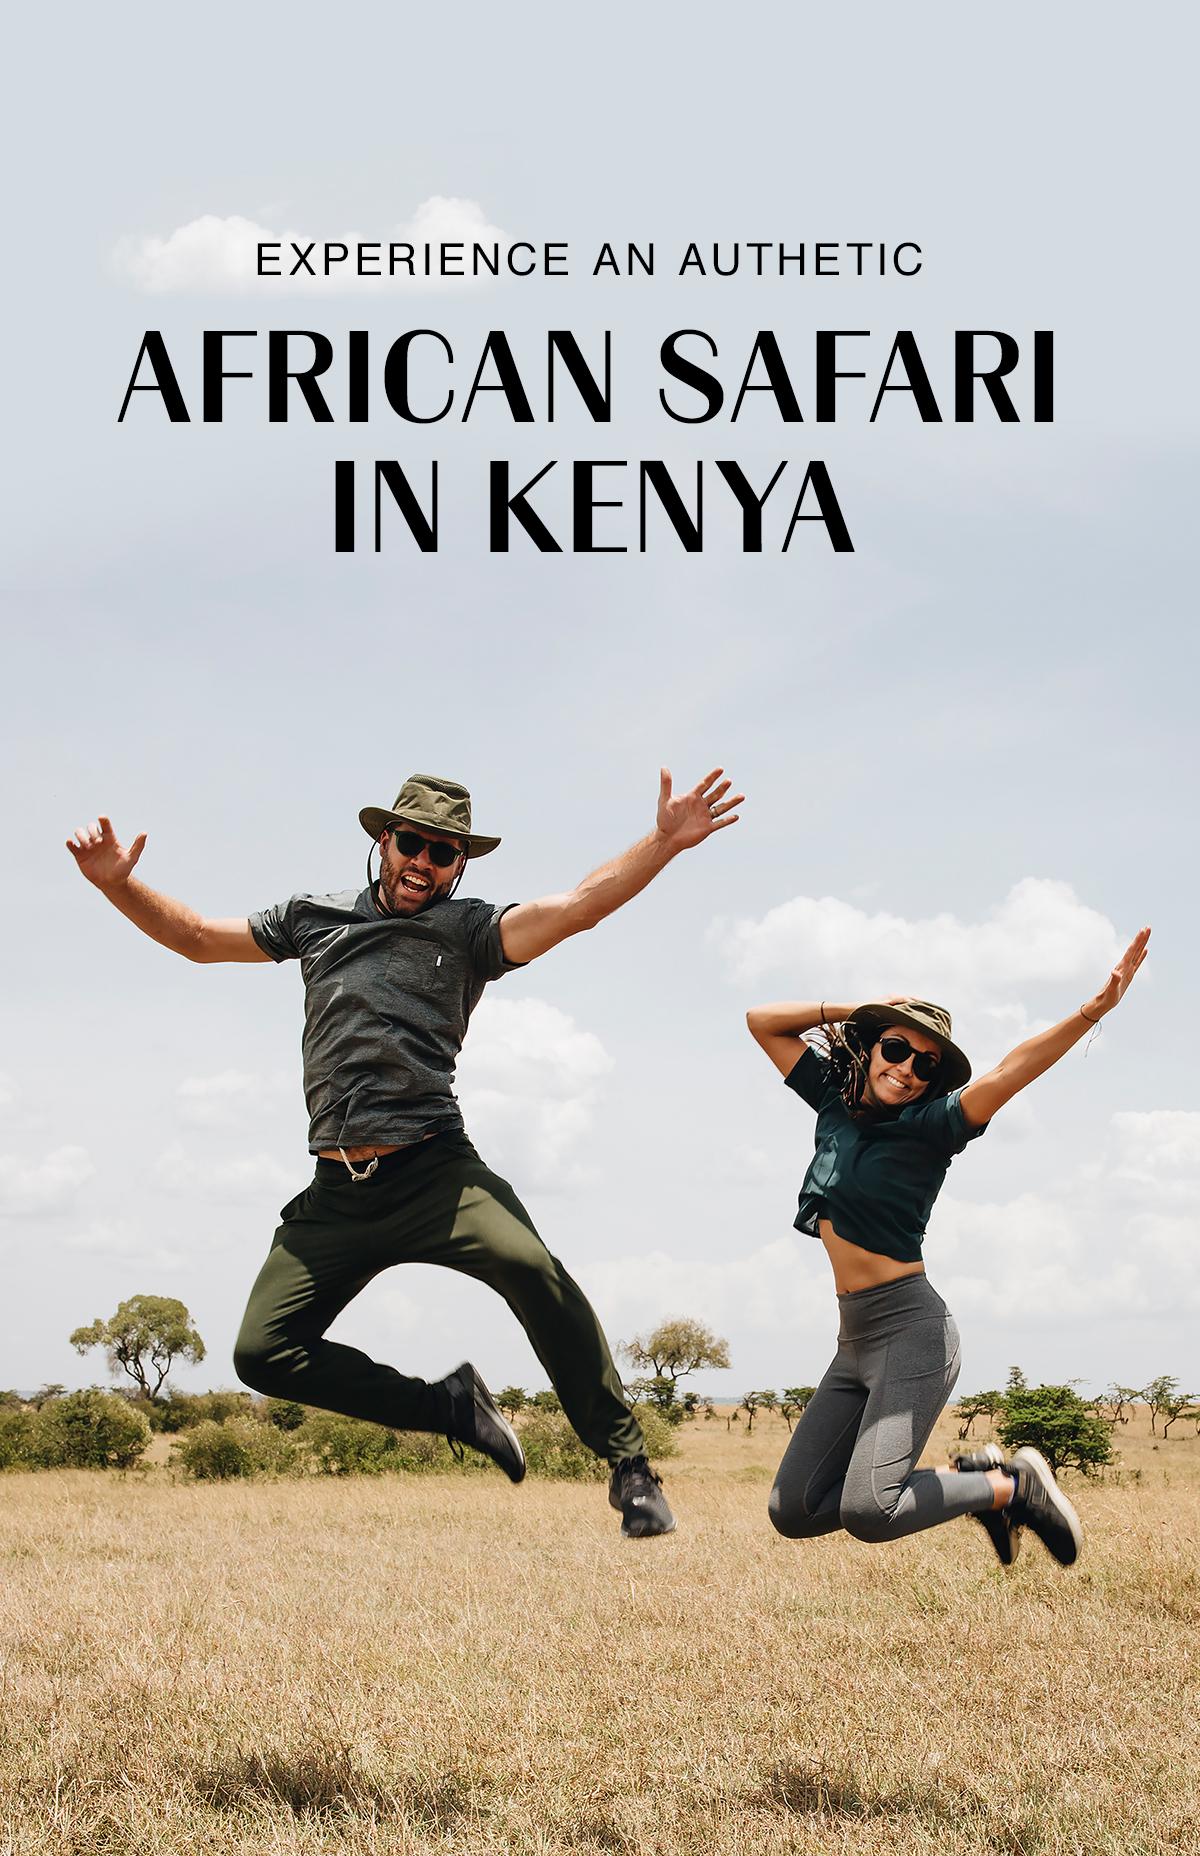 social-chrissihernandez-africa-kenya-masaimara-safari-02.jpg